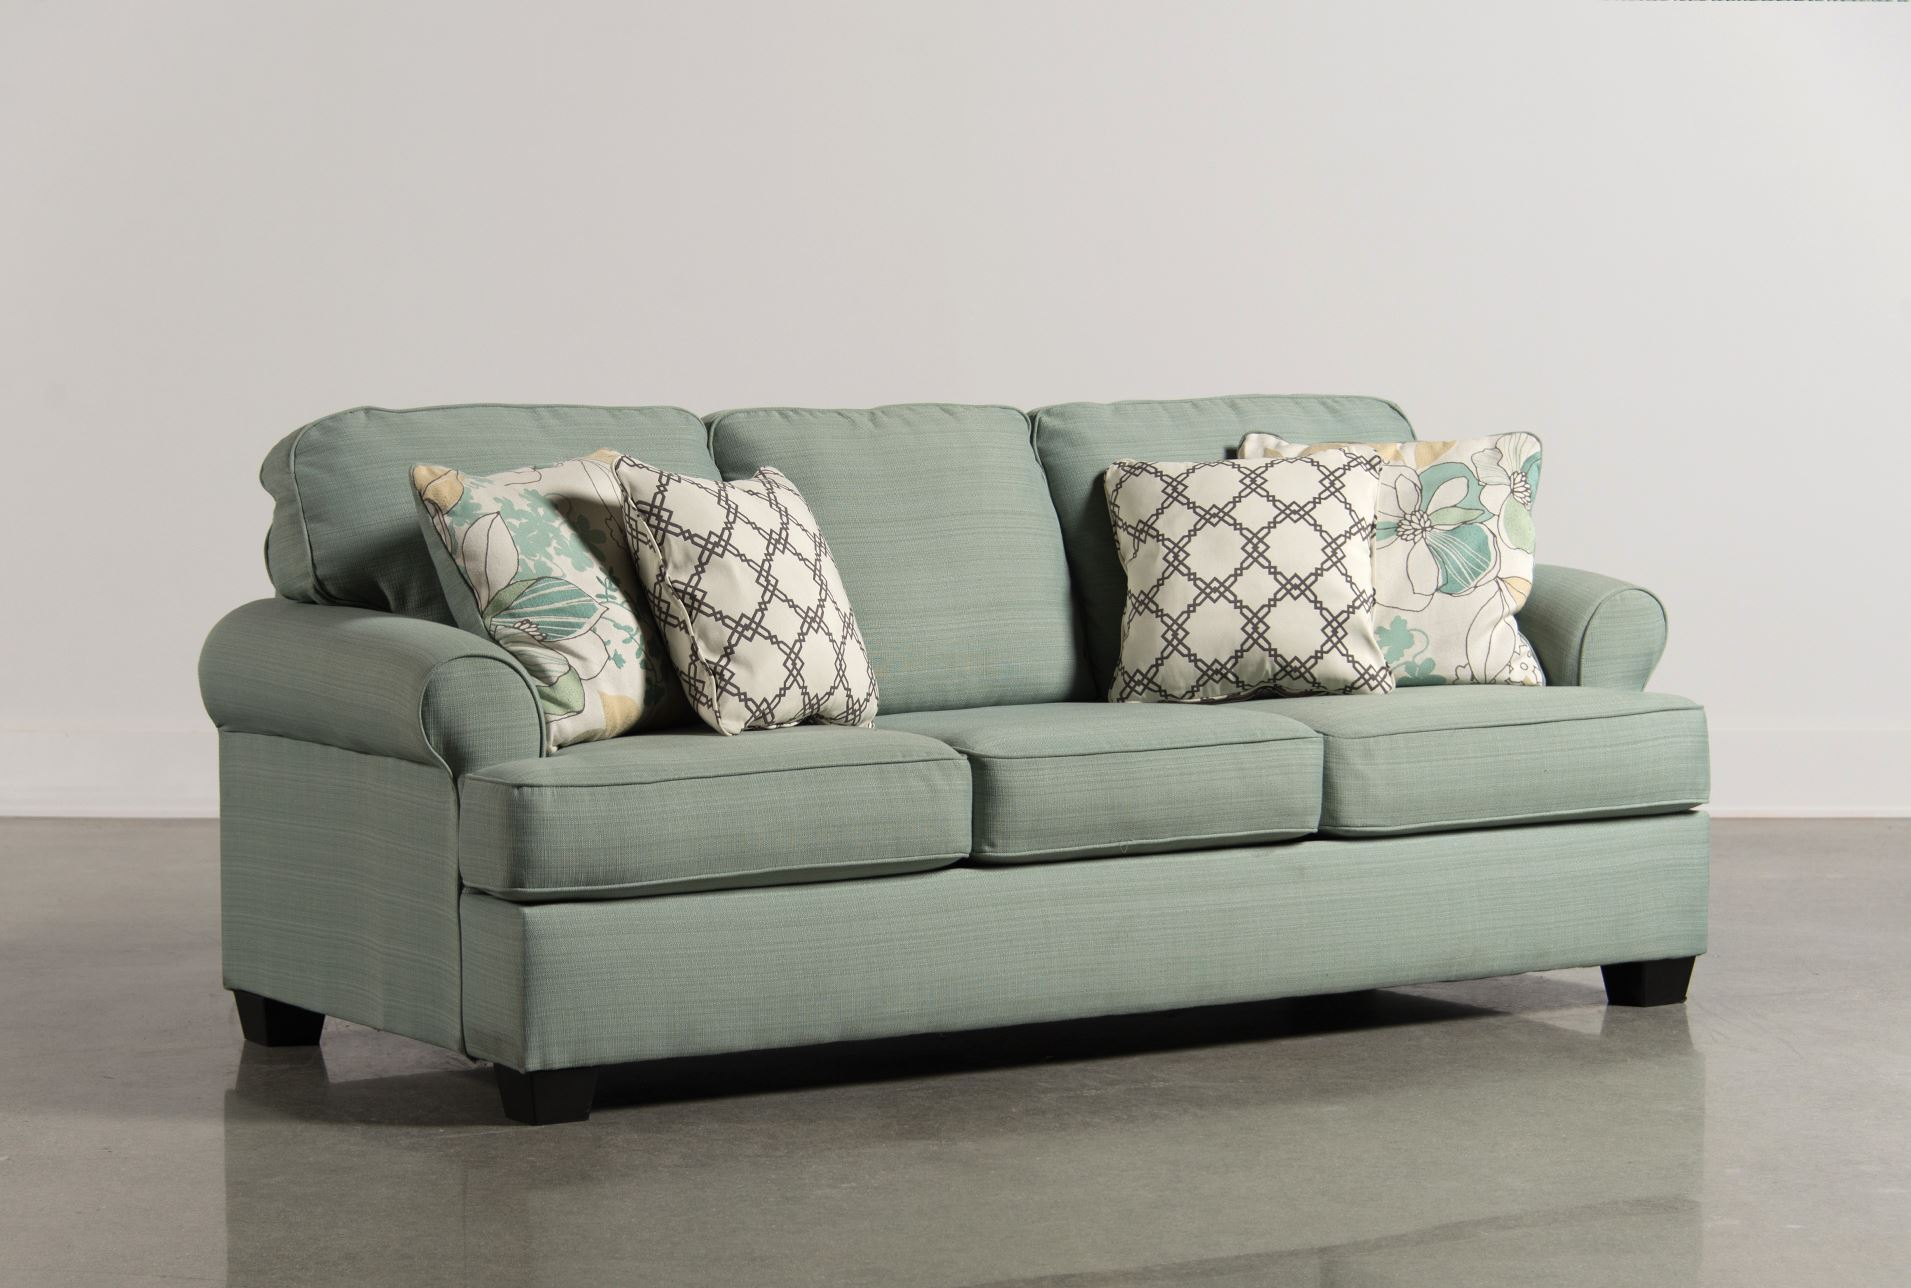 Seafoam Sofa Daystar Living Room Set Signature